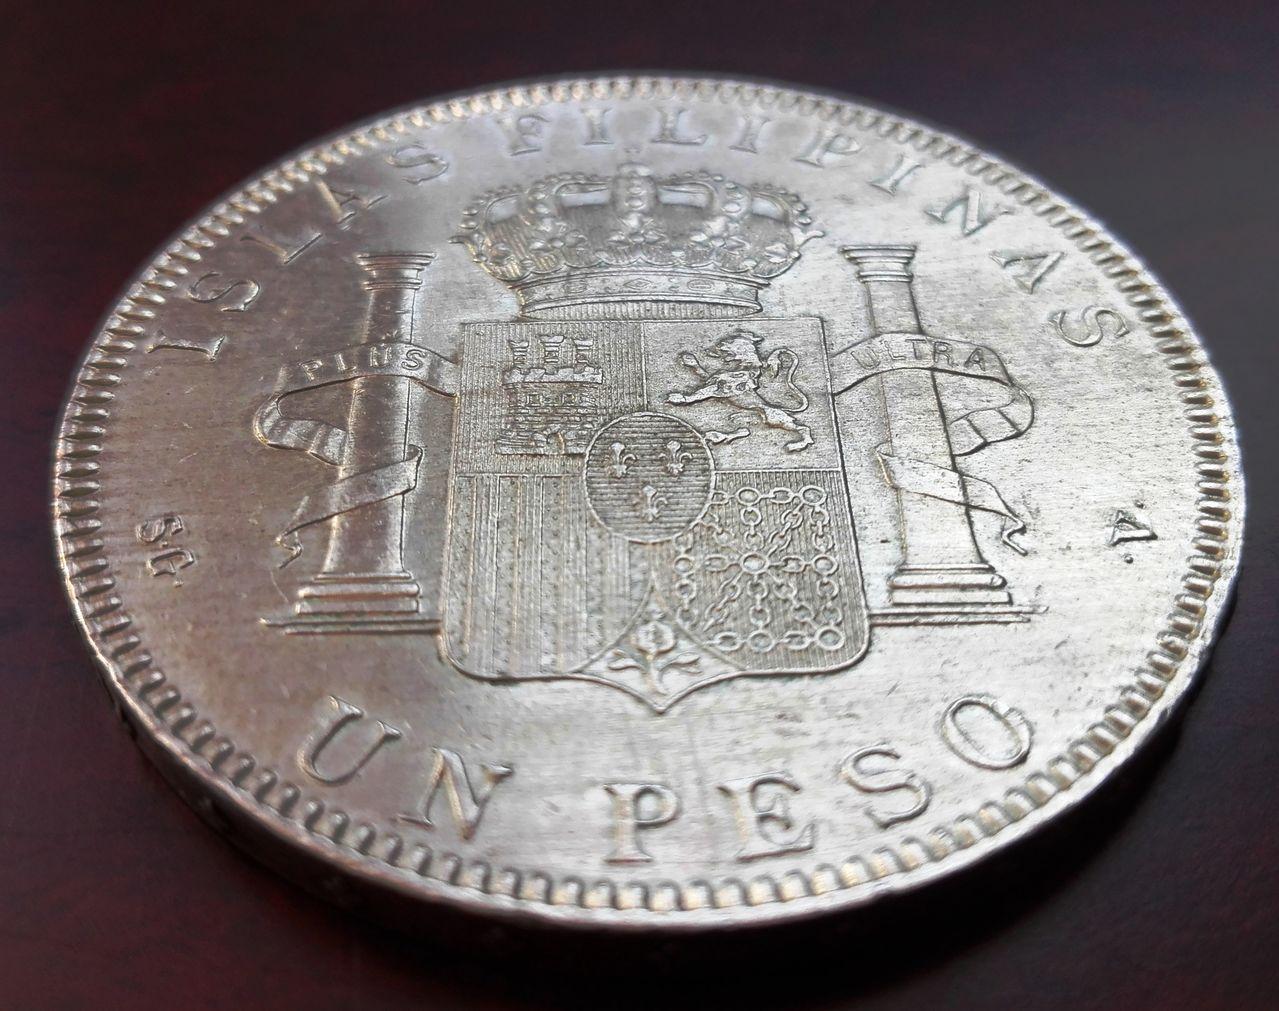 1 peso Filipinas 1897, Alfonso XIII  1_peso_fiolipnas5